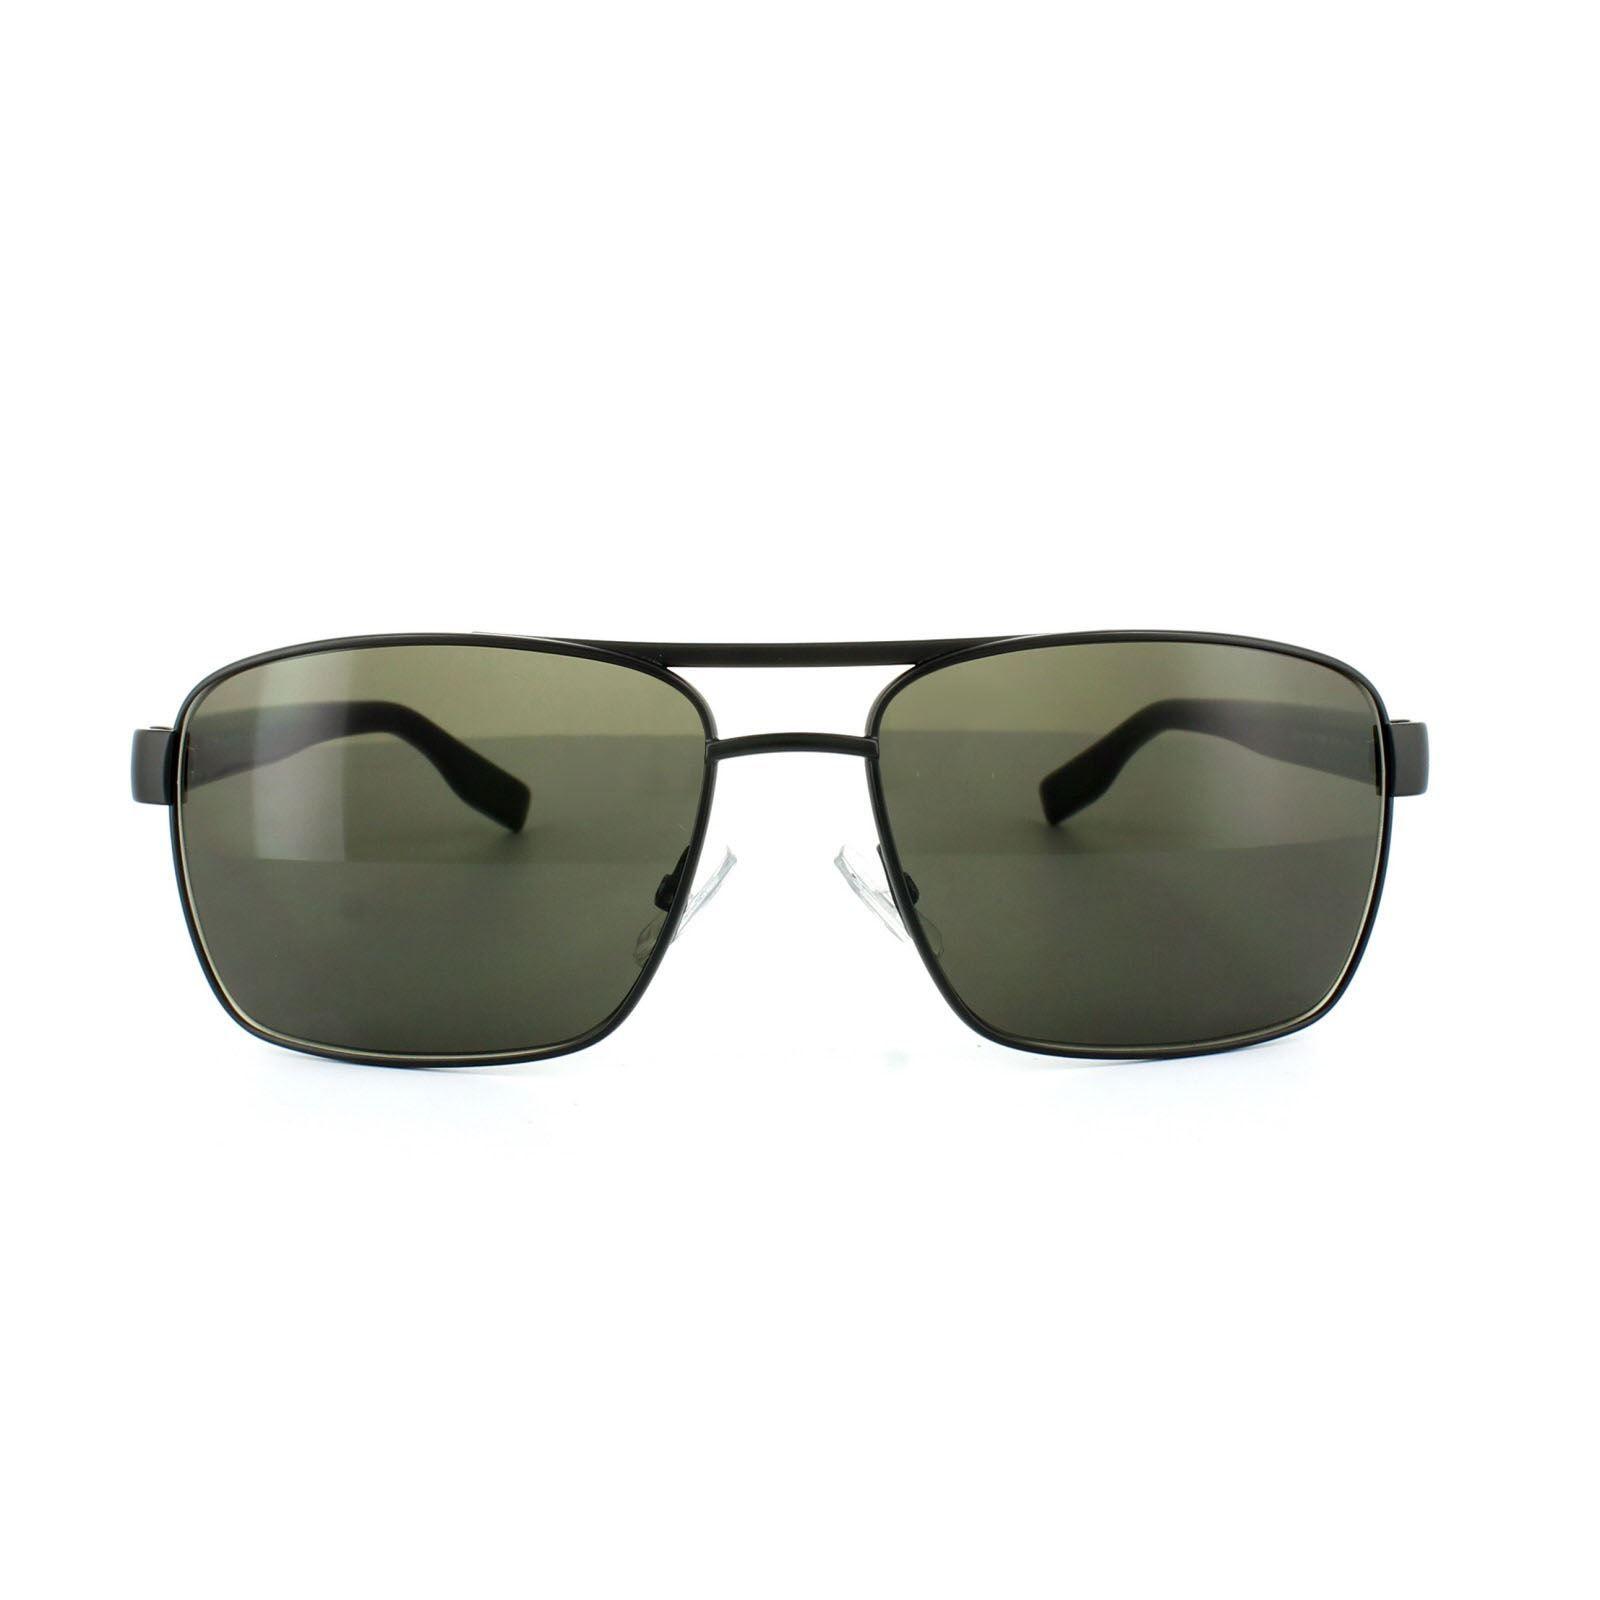 Hugo Boss Sunglasses 0592 6VB NR Black Dark Grey